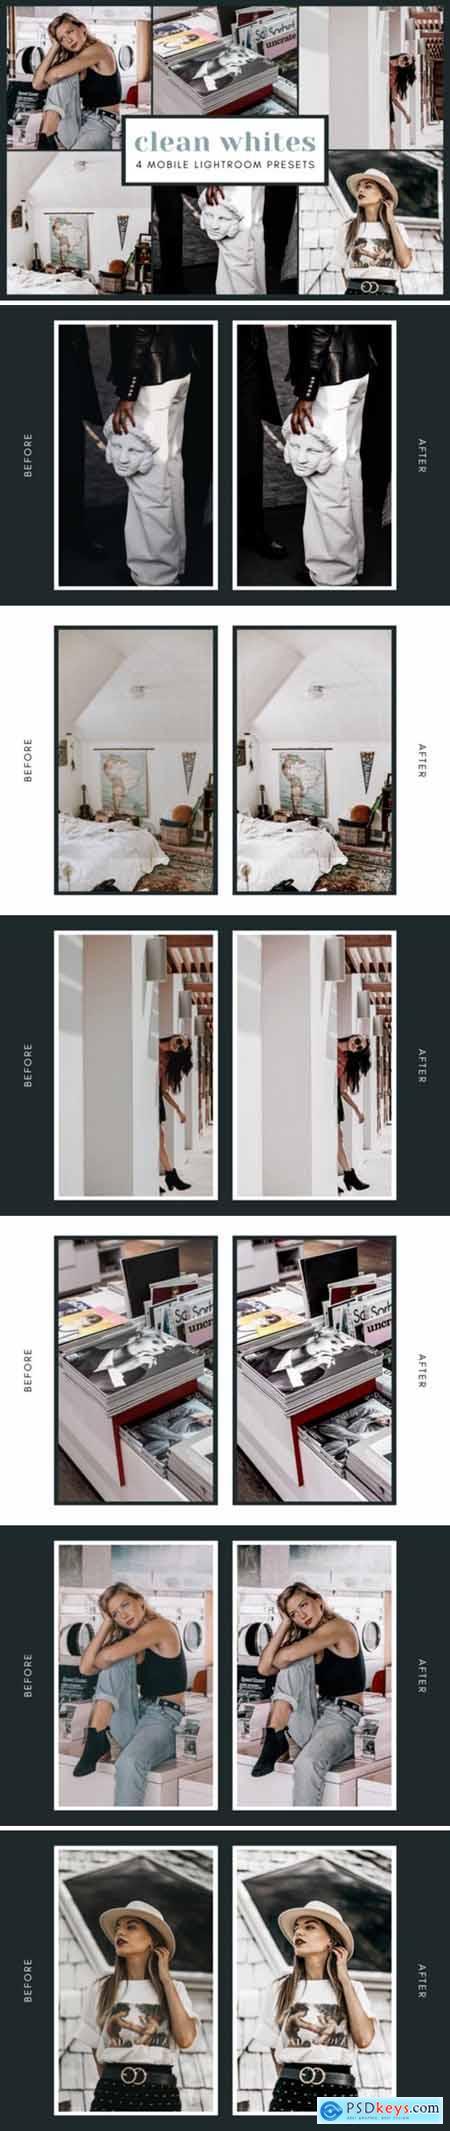 4 Mobile Lightroom Presets - Clean White 2651993